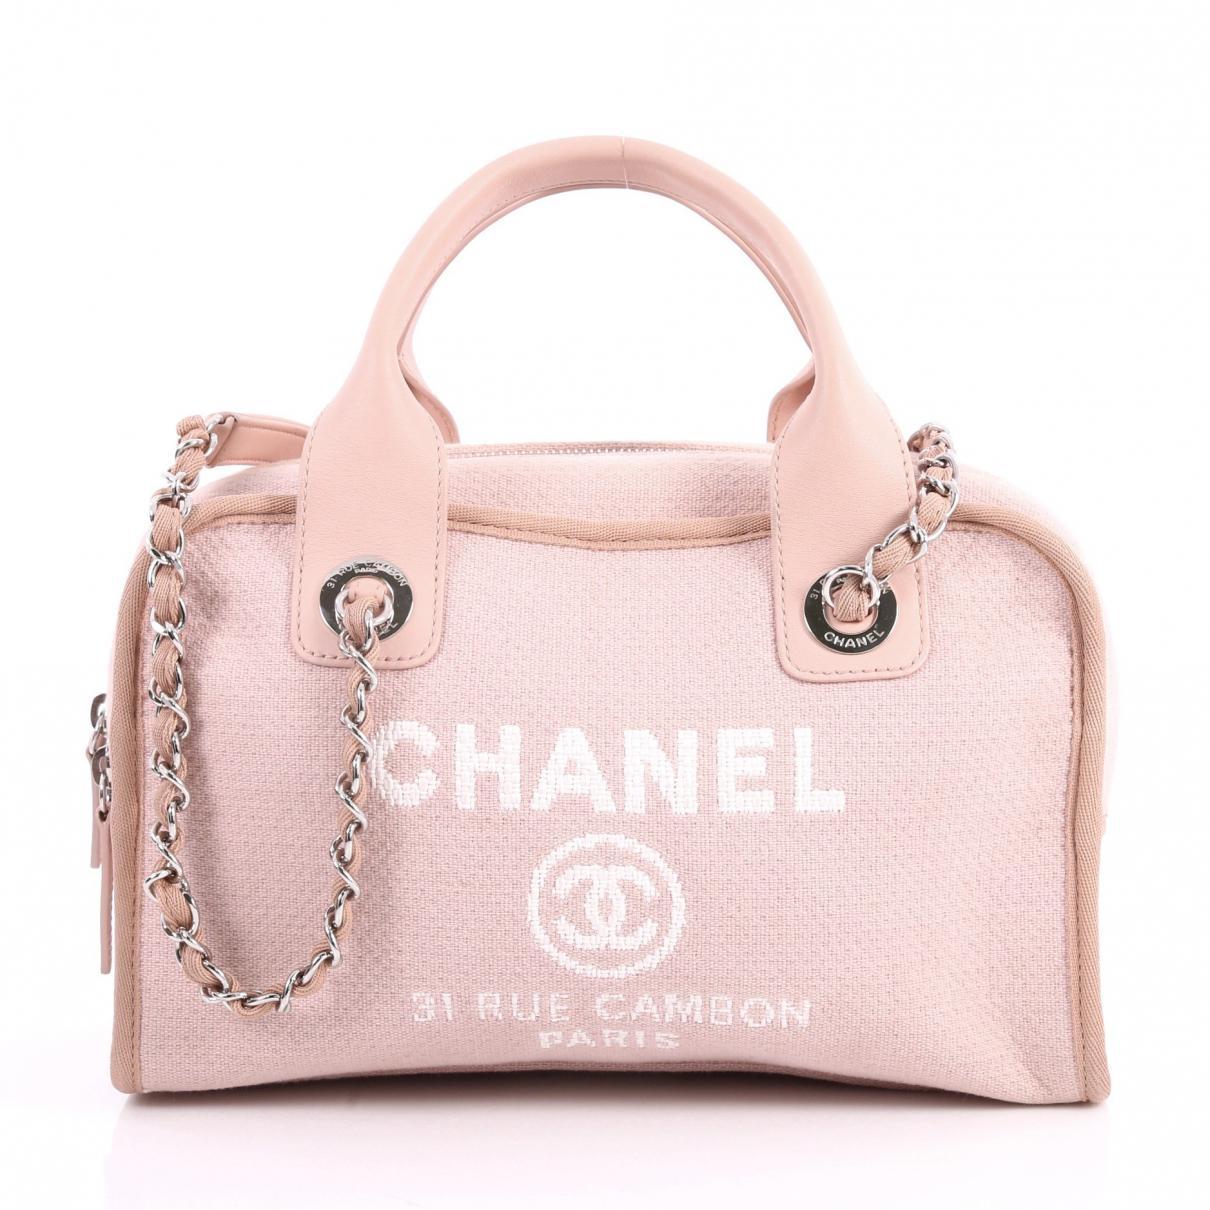 Harga Jual Chanel Deauville Terbaru 2018 Klakson Denso Waterproof Relaykabelsekring Cloth Handbag In Pink Lyst